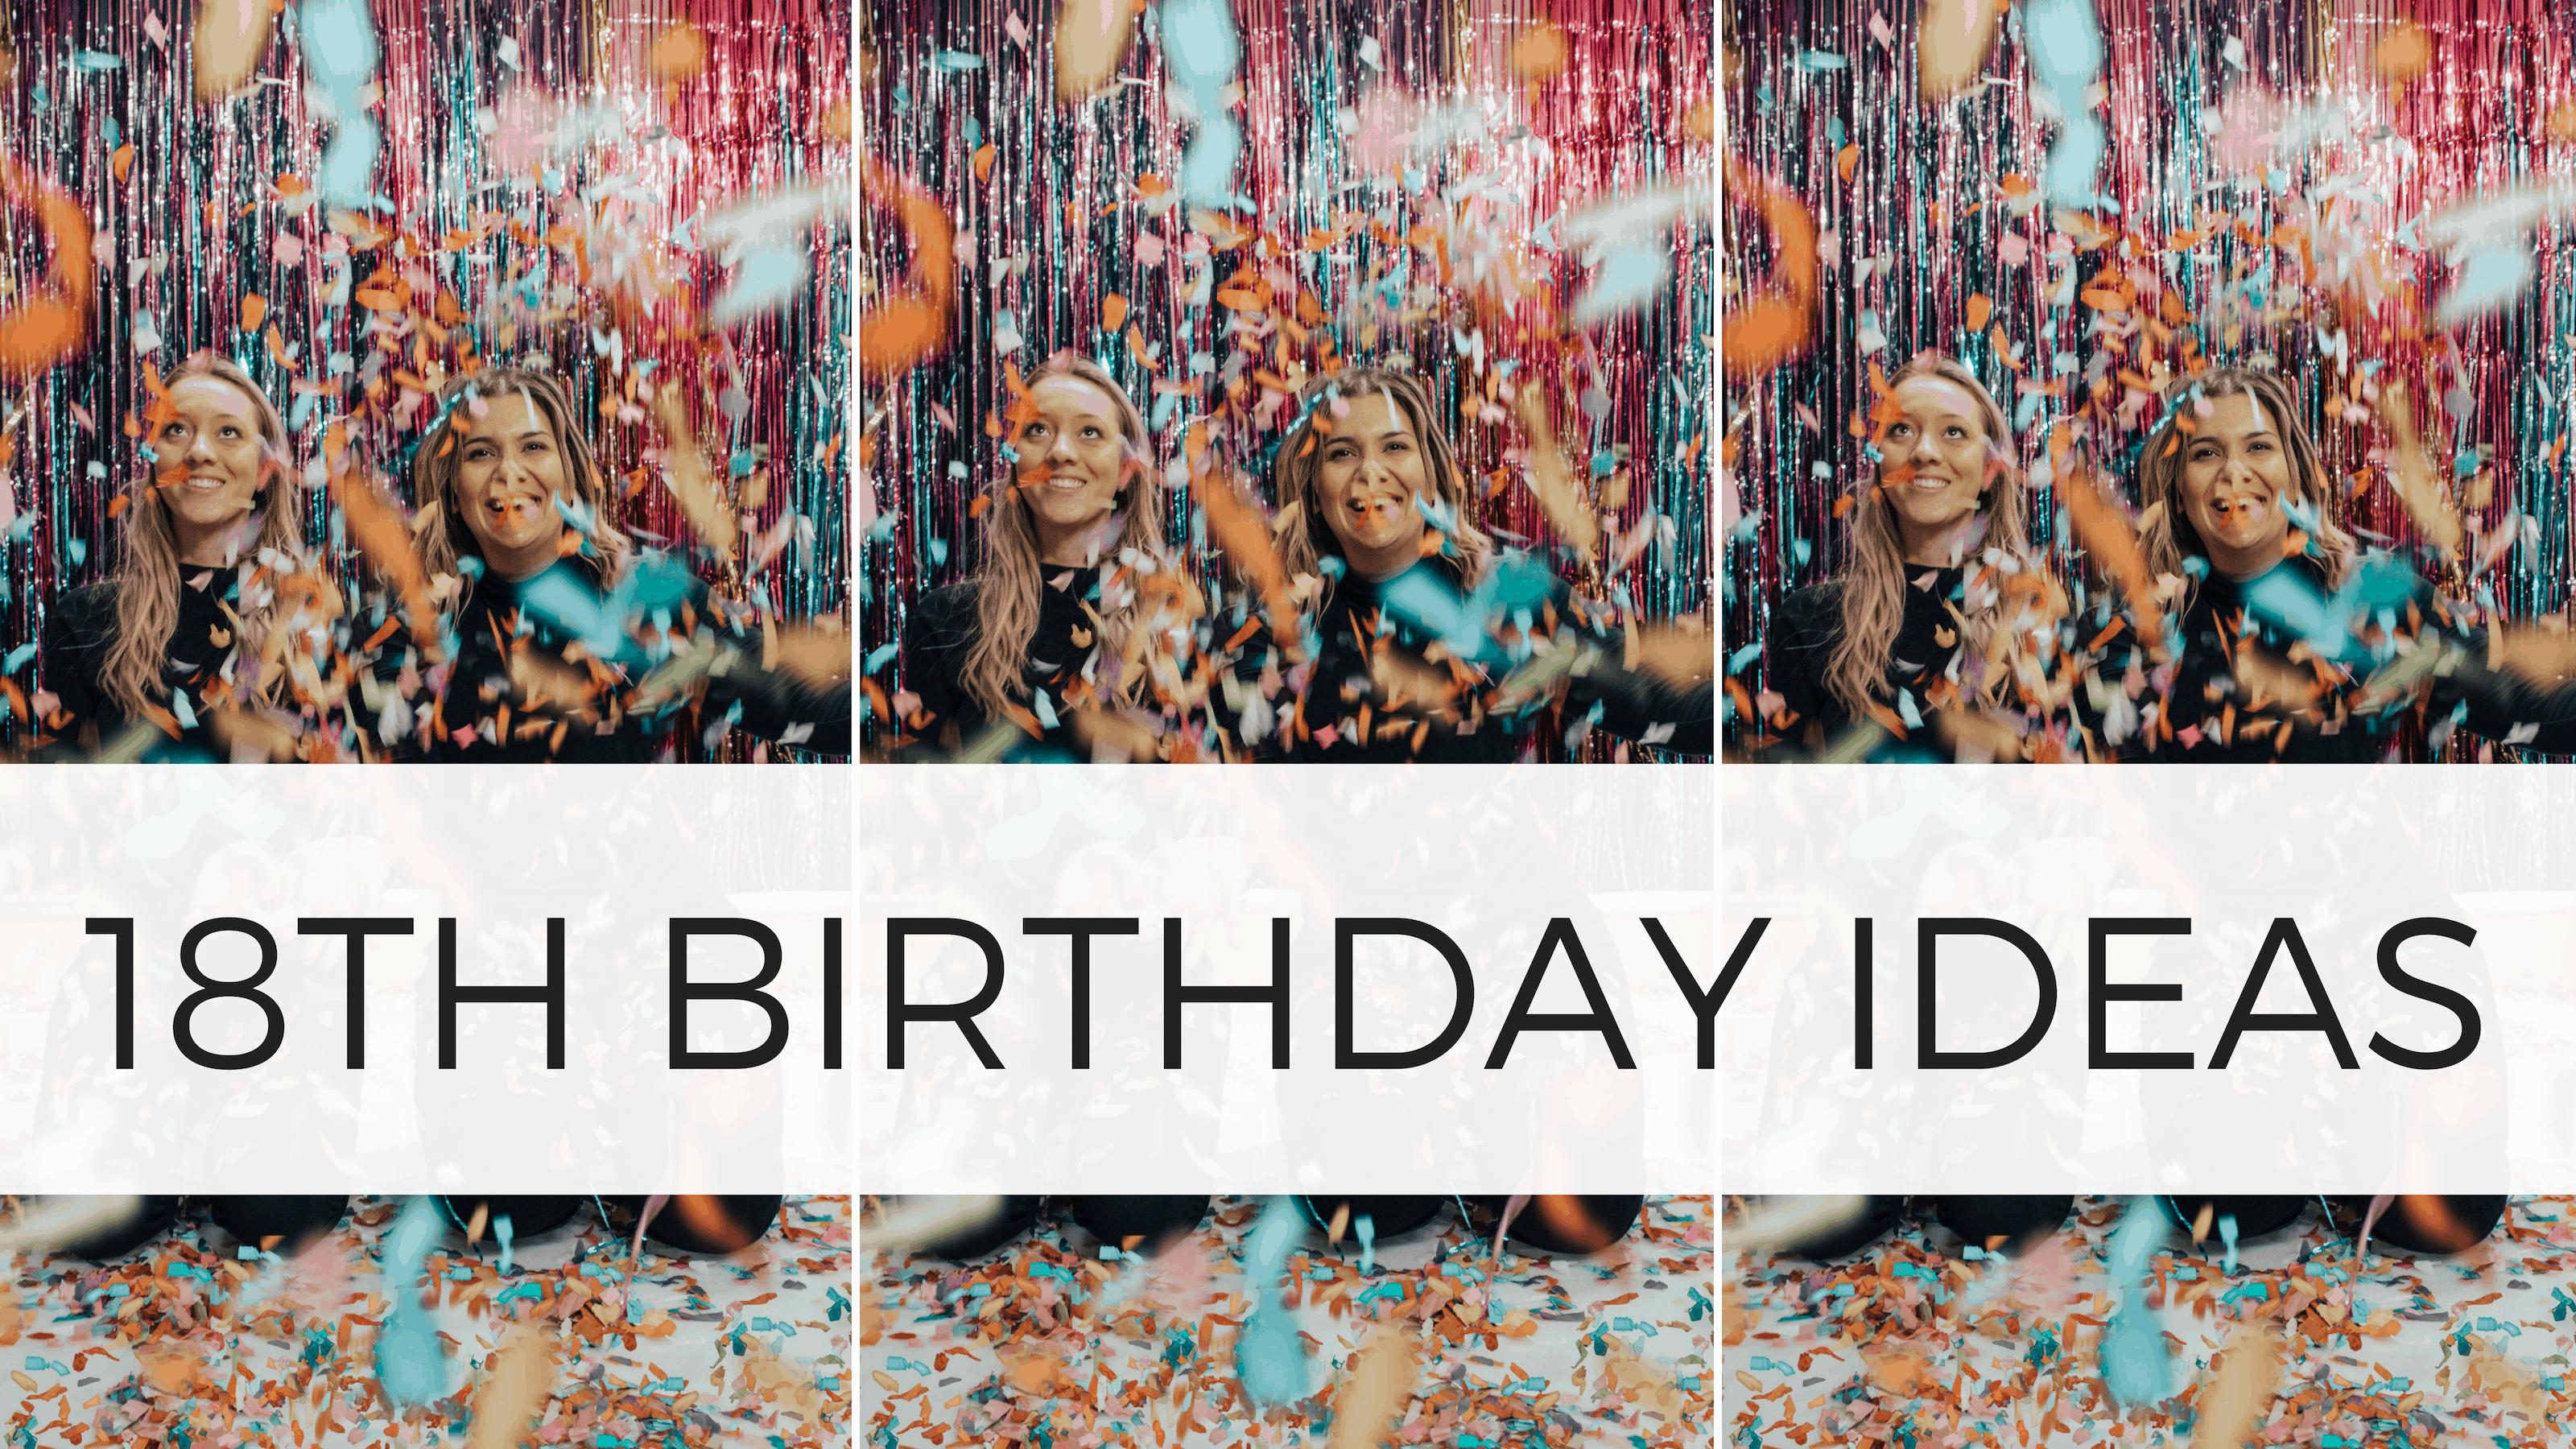 Best 18th Birthday Ideas | 35 Insanely